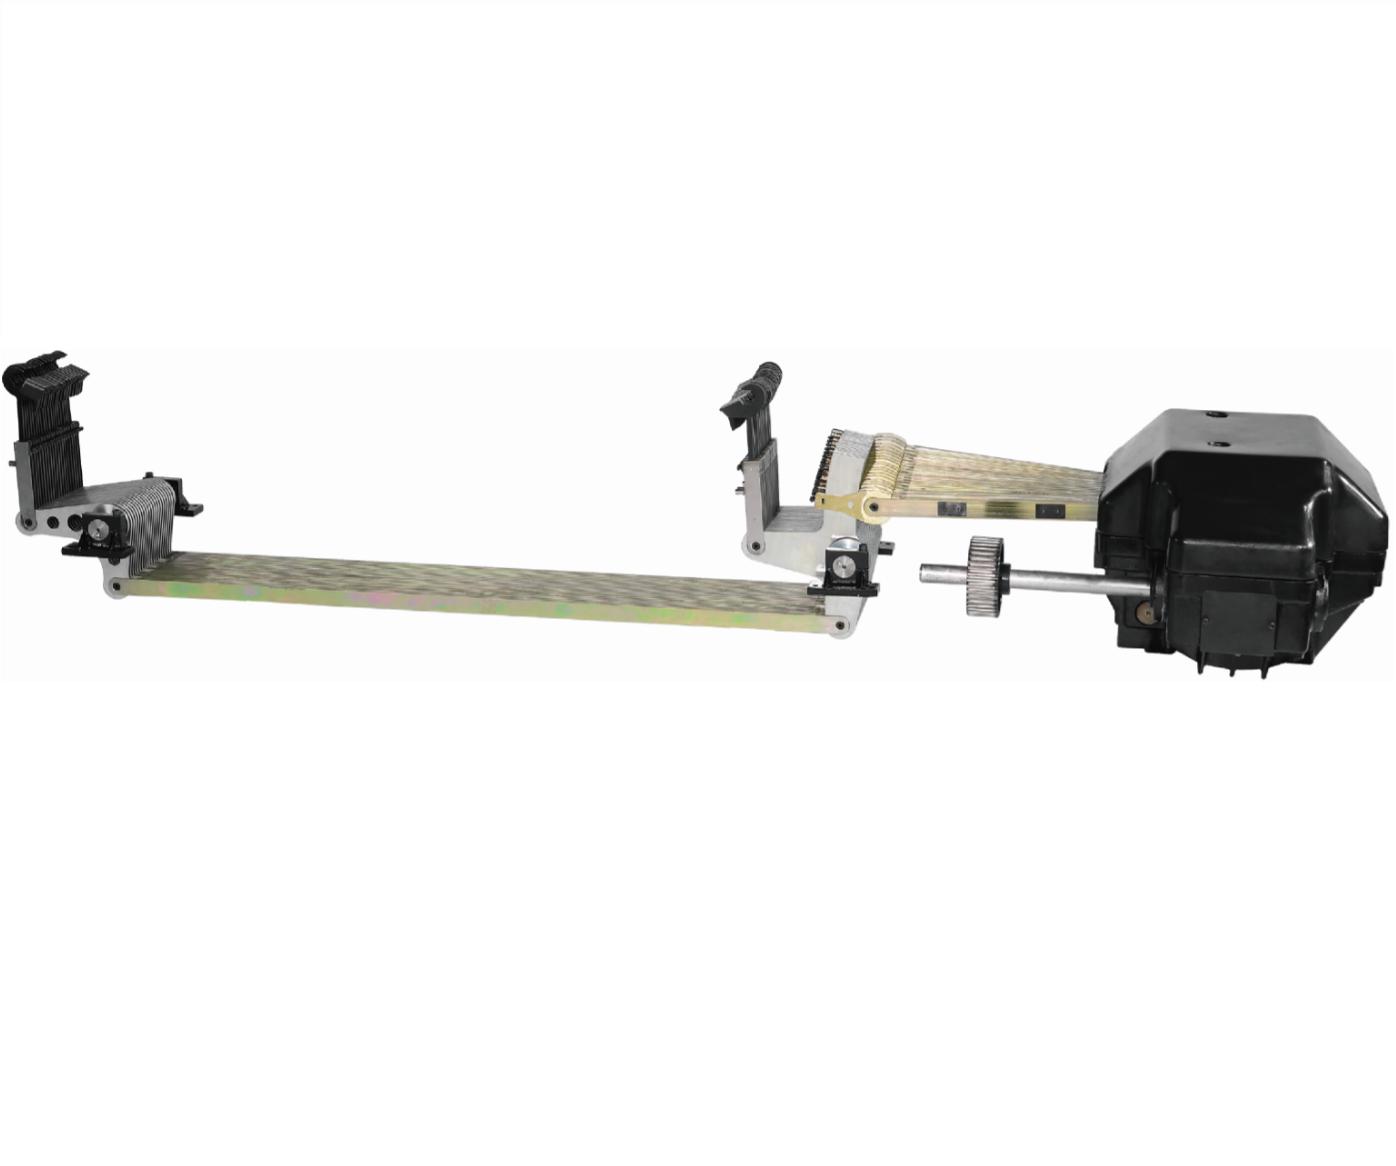 Electronic Dobby Shedding Machine for Rapier Loom